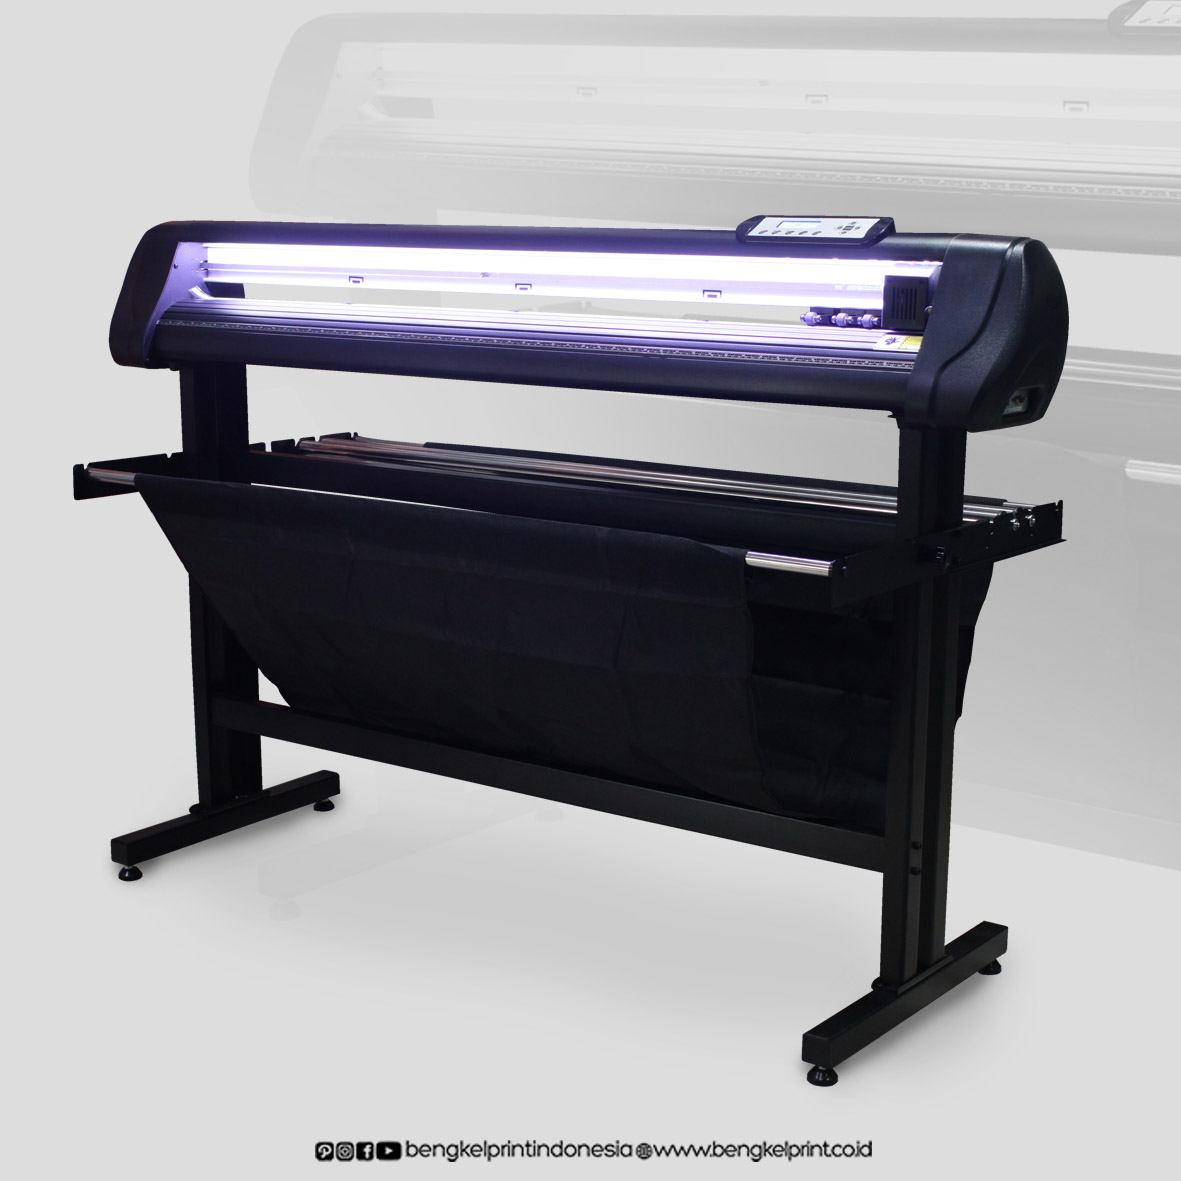 JINKA 1351NXL PRO LED | Bengkel Print Indonesia